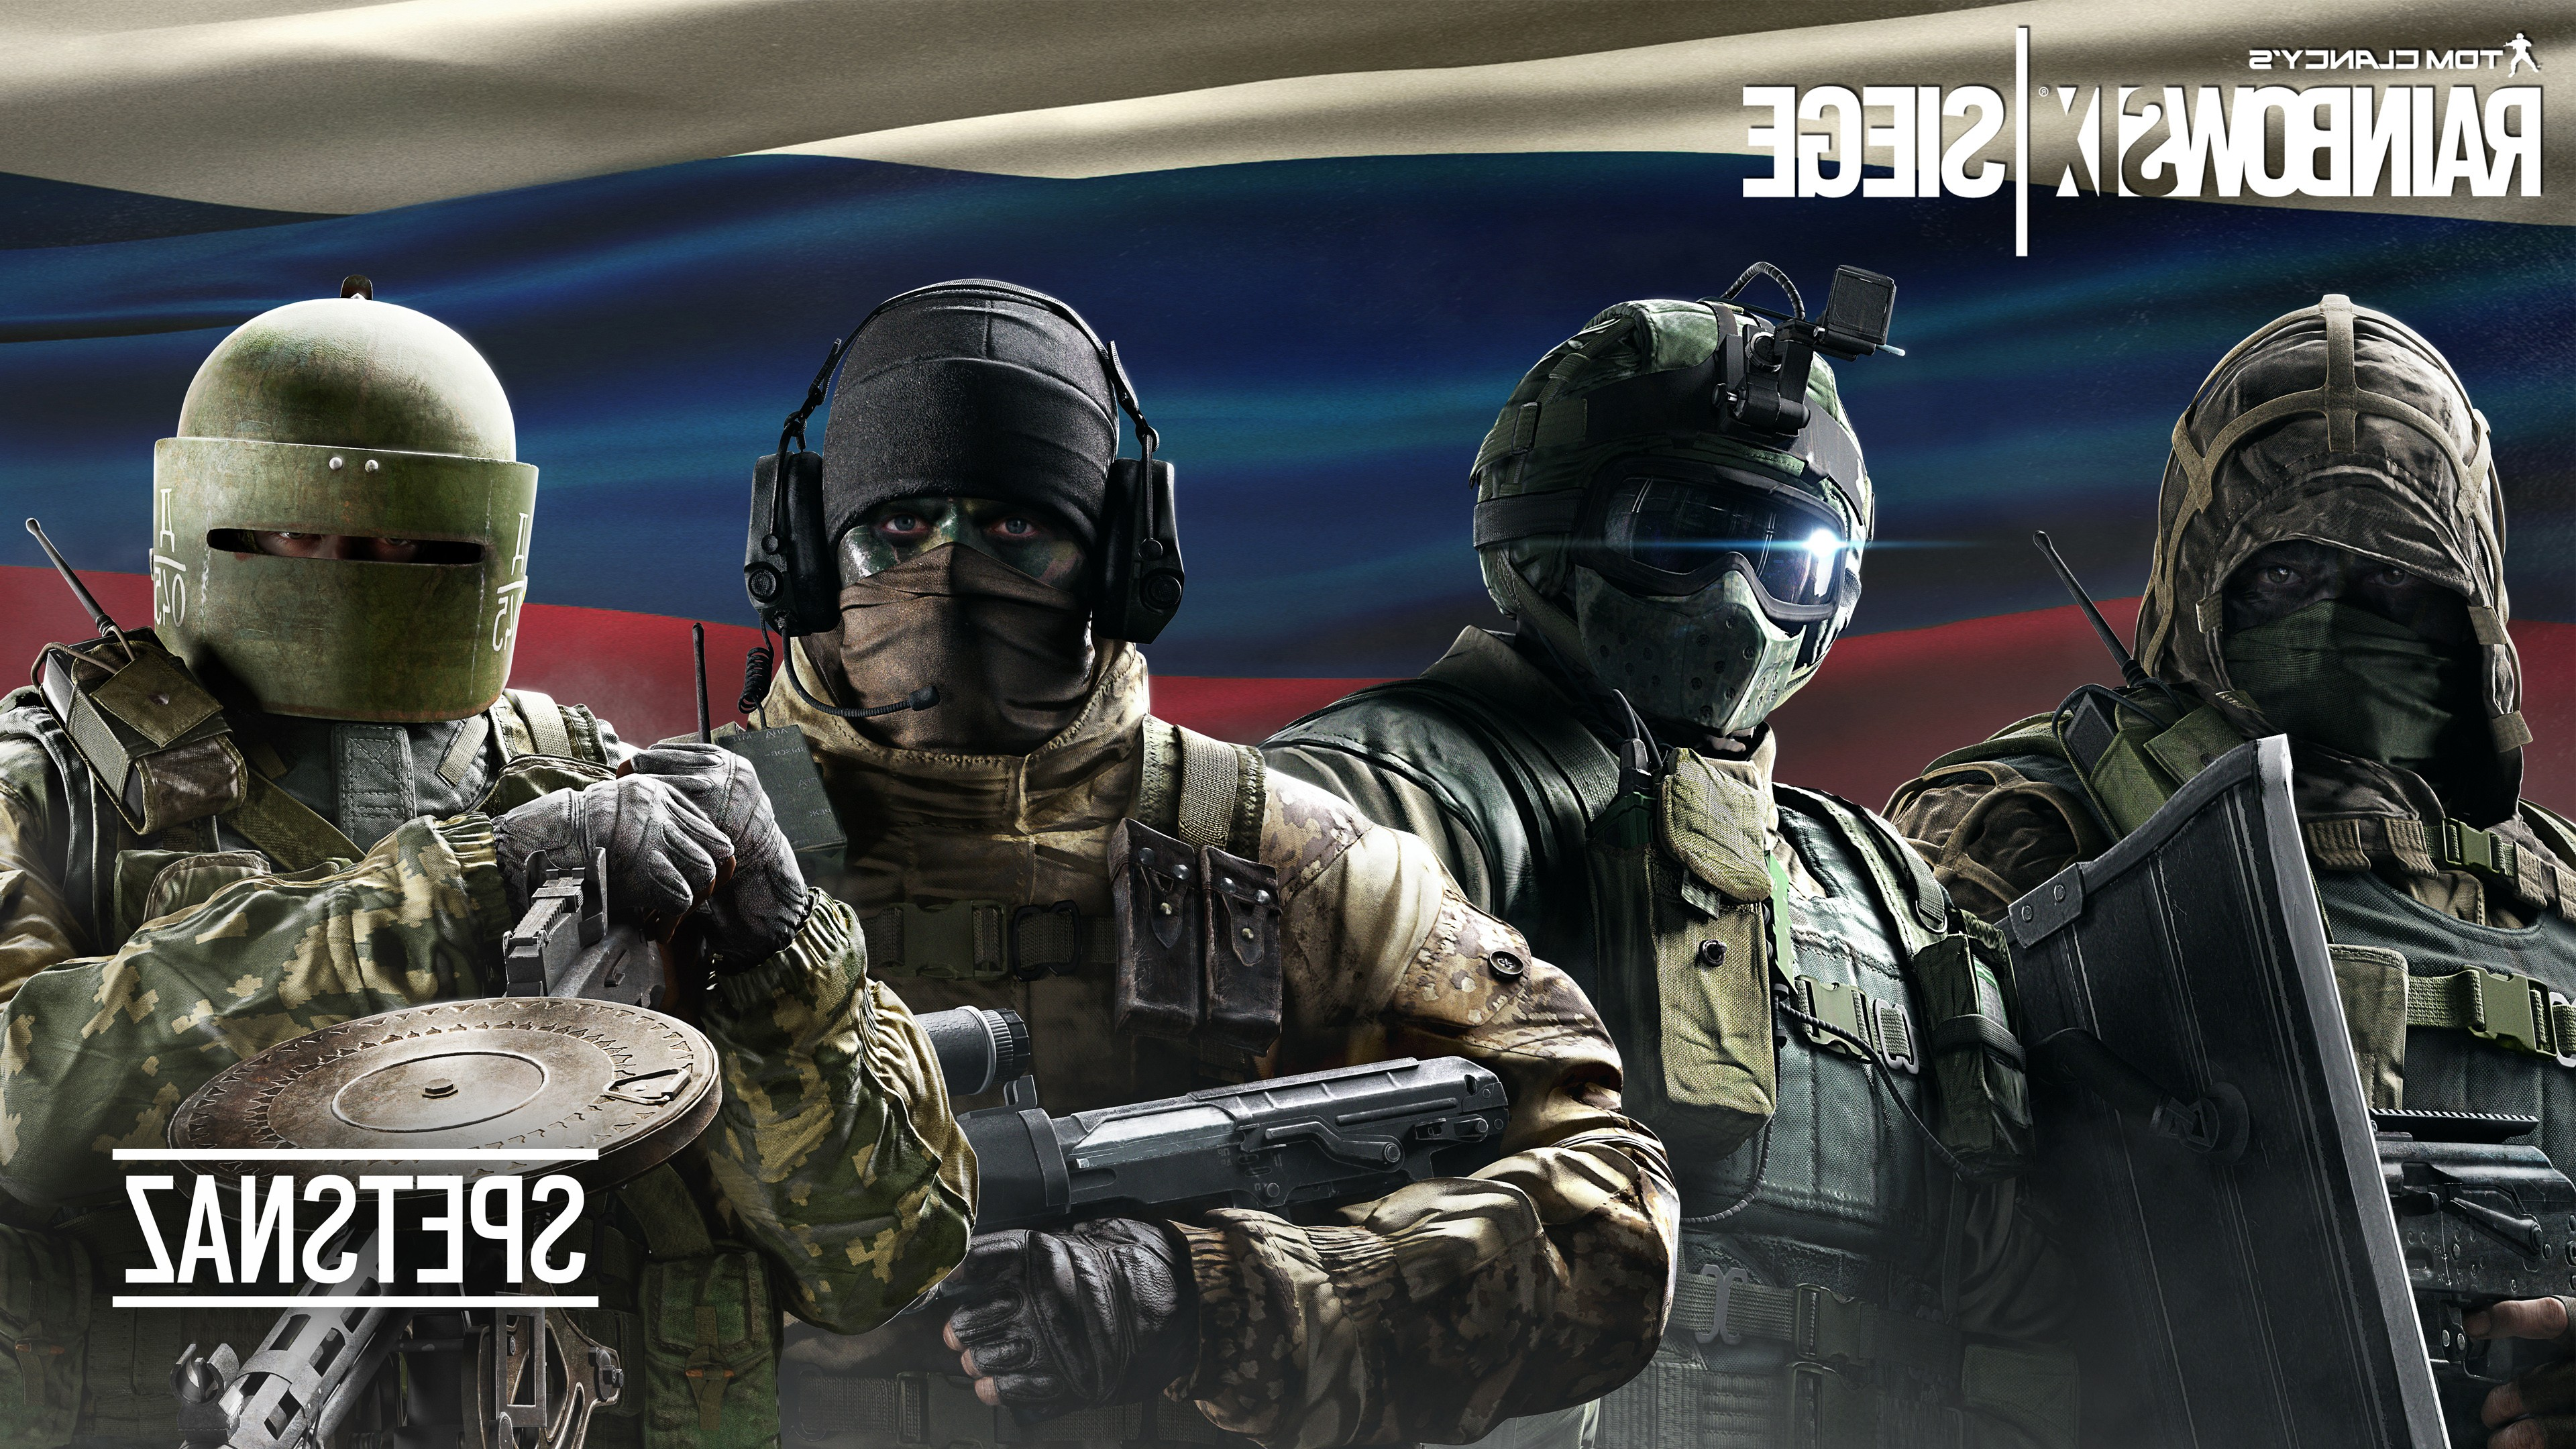 Wallpaper 4k Tom Clancys Rainbow Six Siege Spetsnaz Games Wallpapers